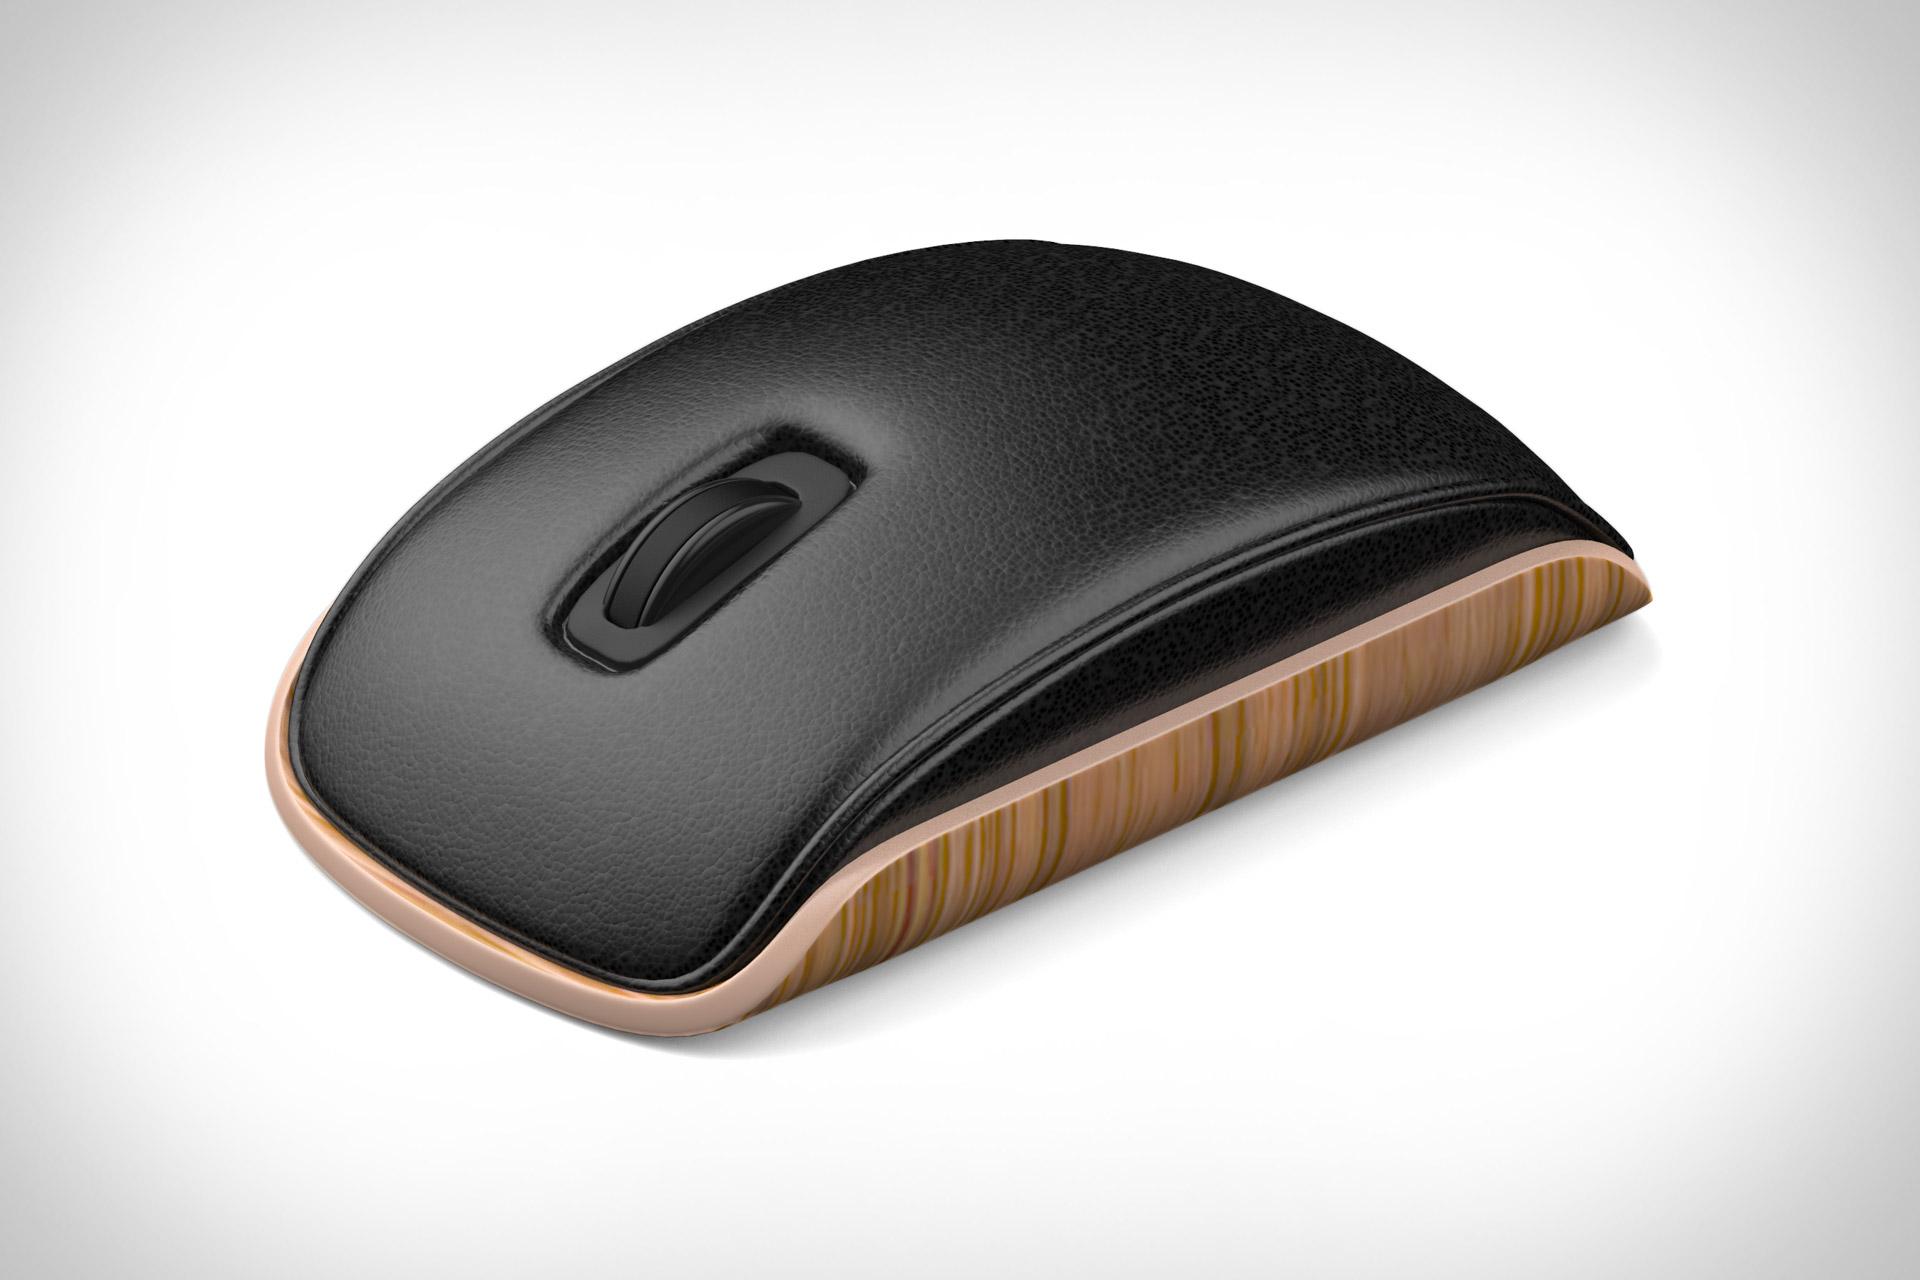 Lounge Mouse Concept